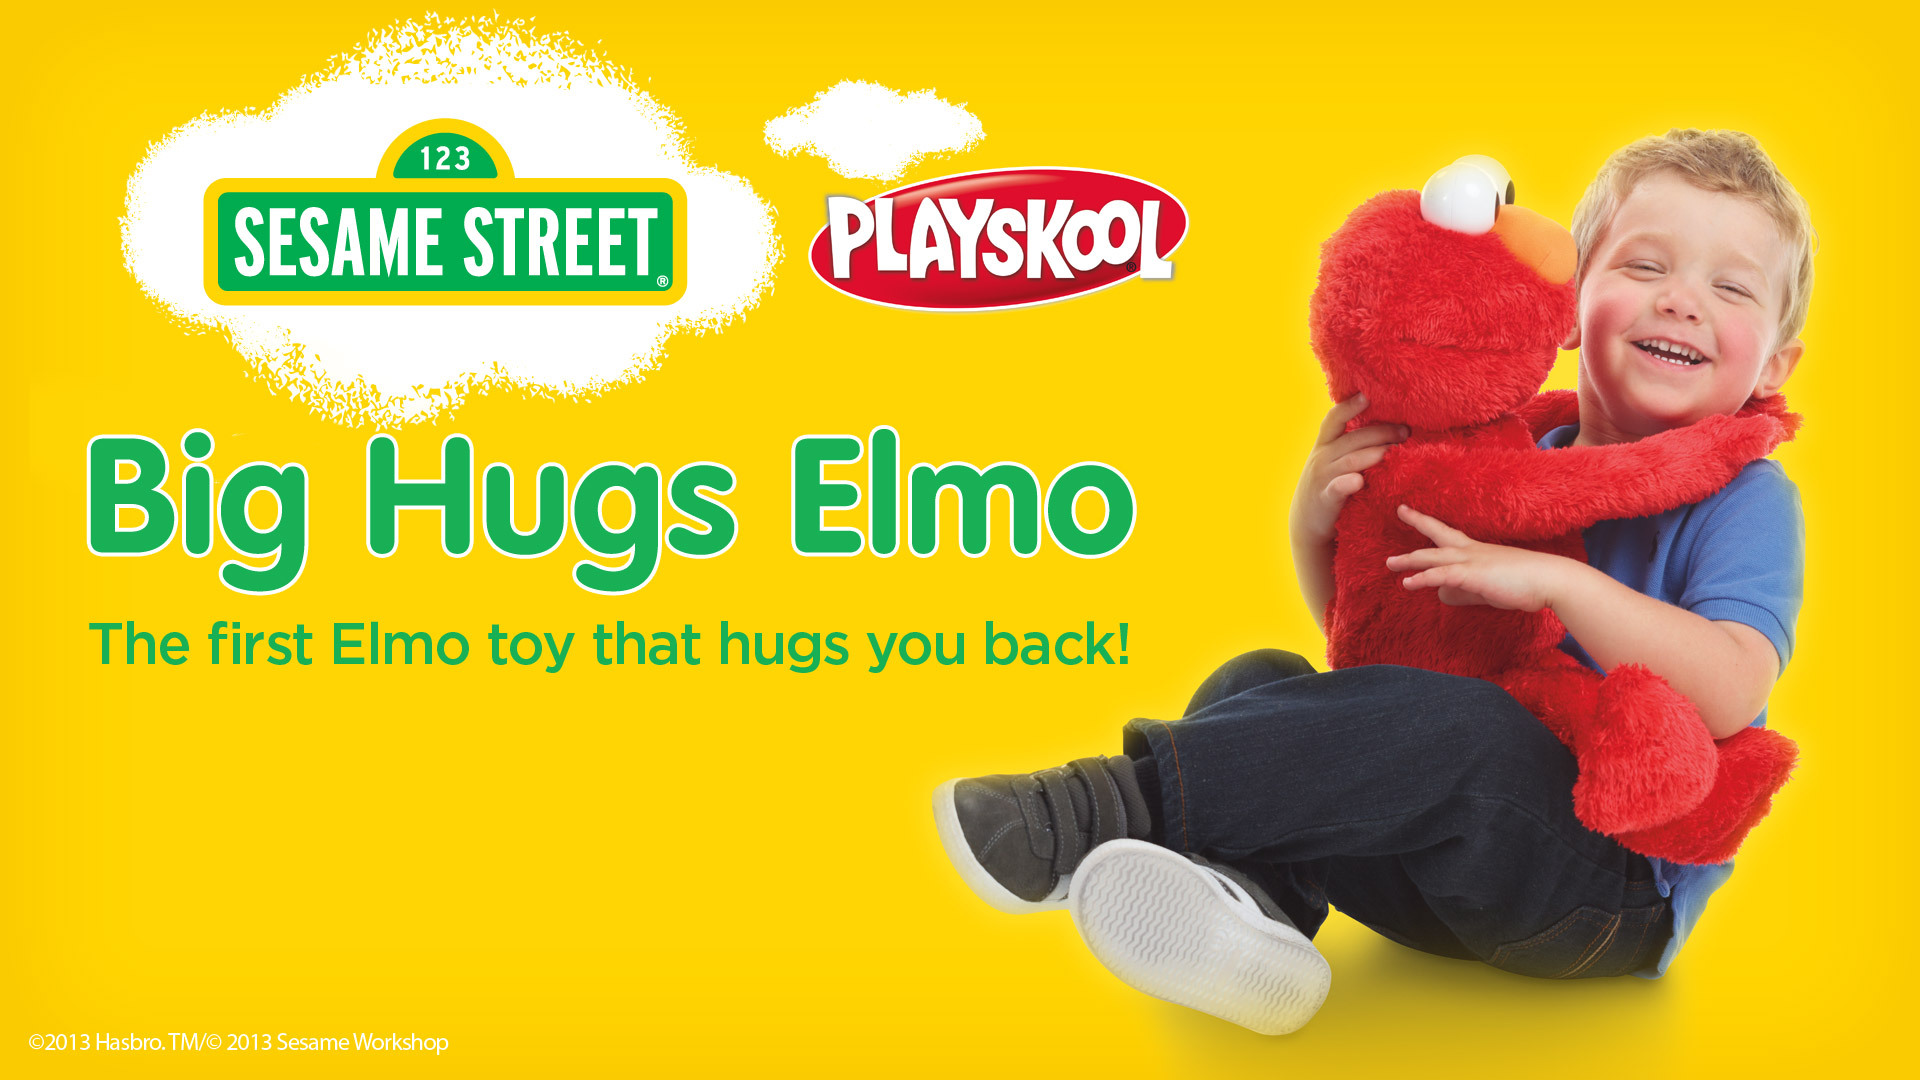 big hugs elmo instructions